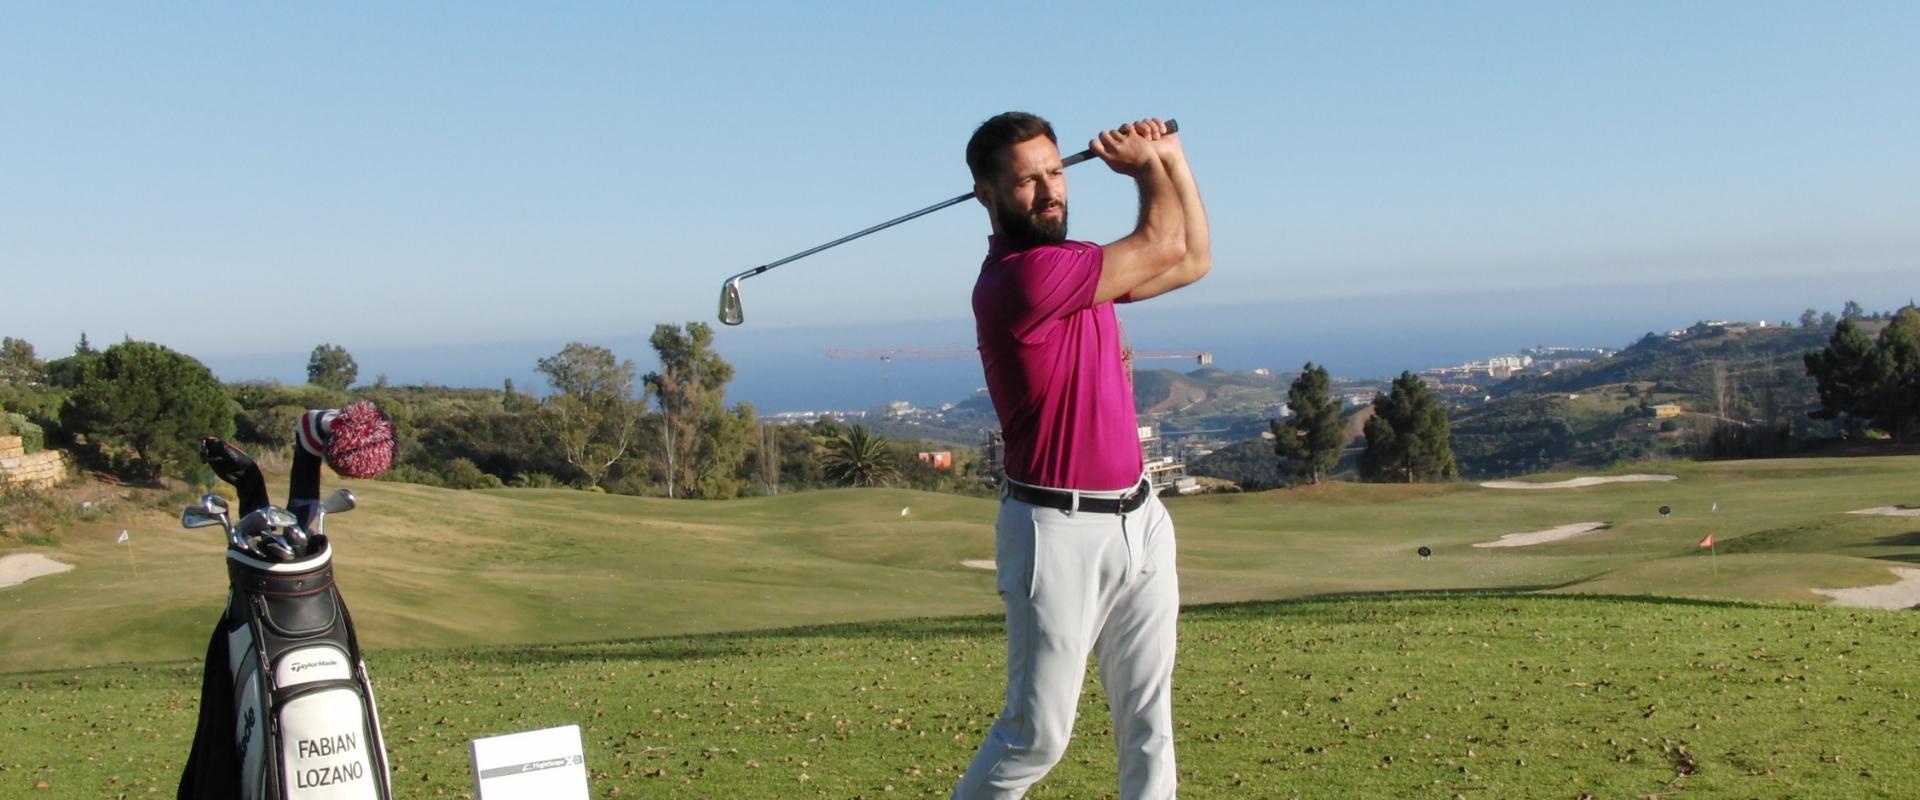 swing fabian lozano golf